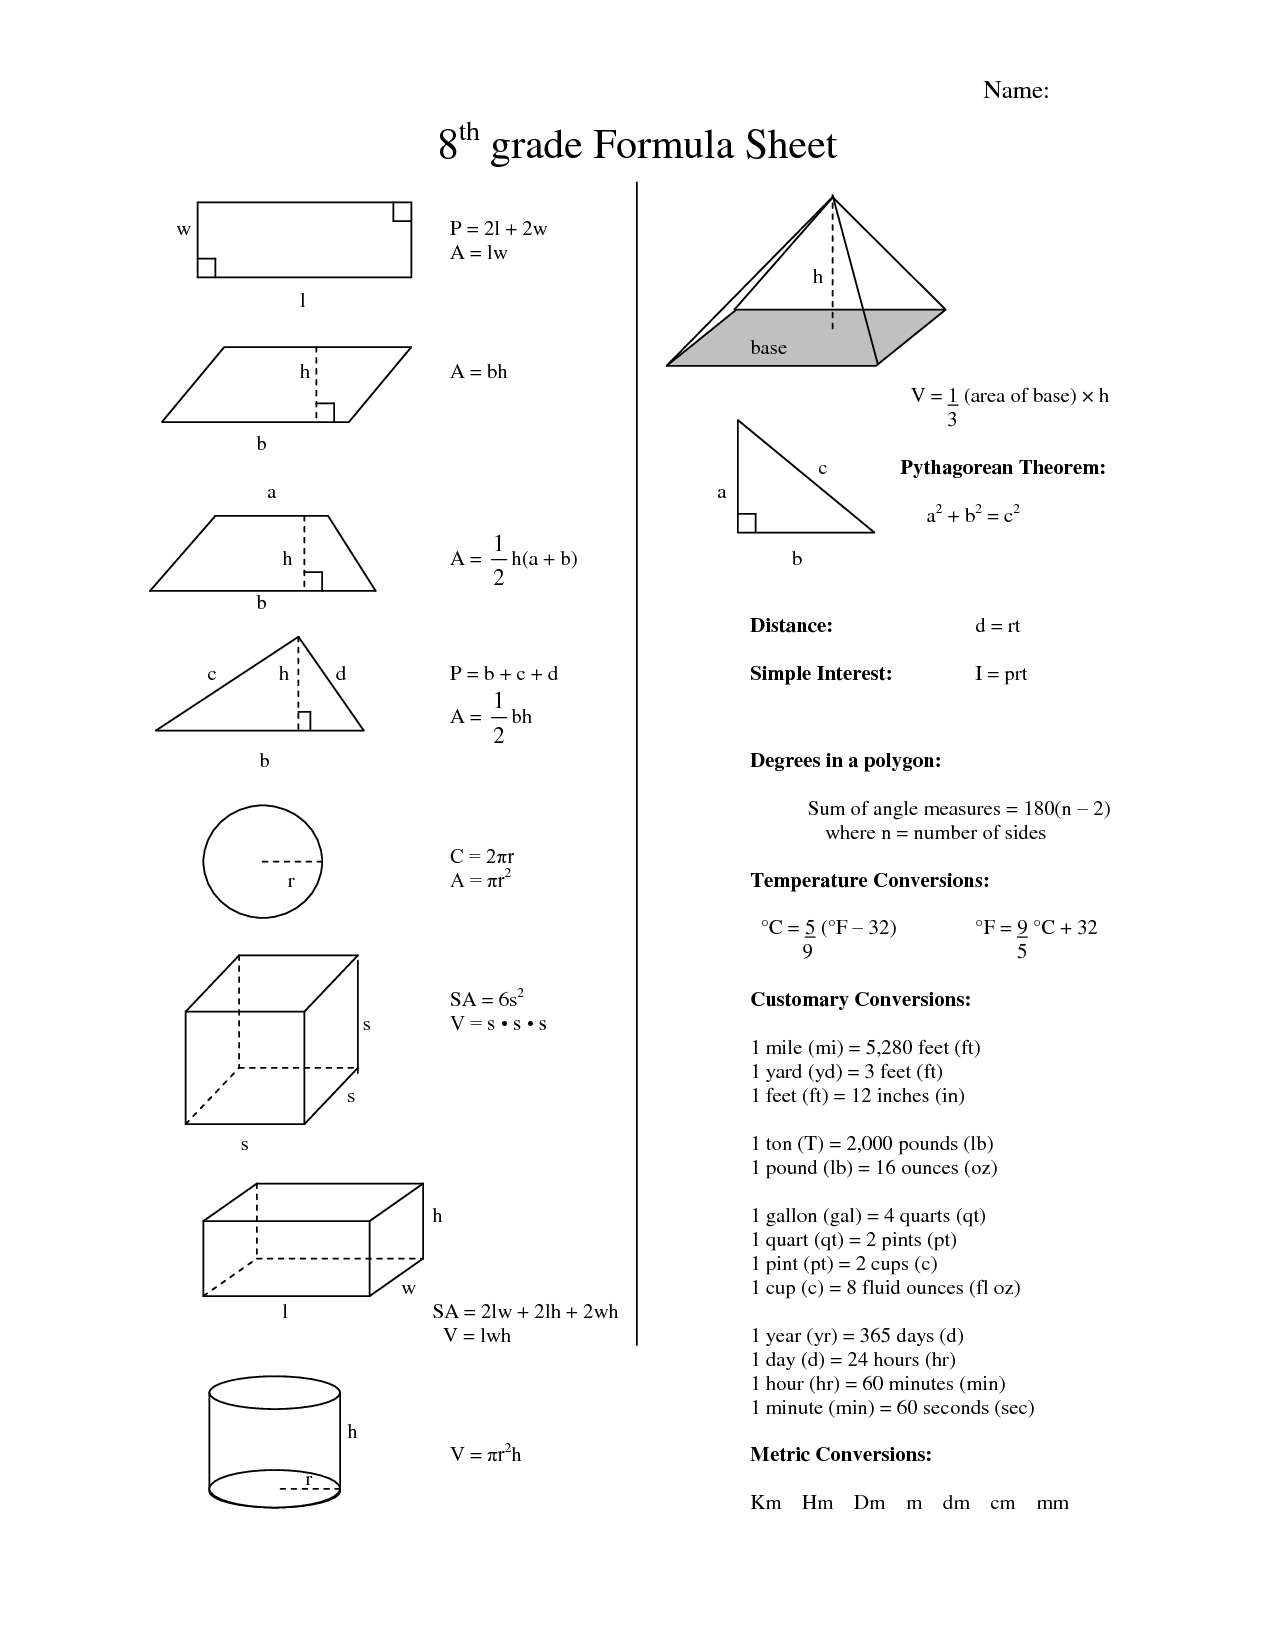 medium resolution of Eighth Grade Math Formula Chart   8th grade Formula Sheet   Math formulas